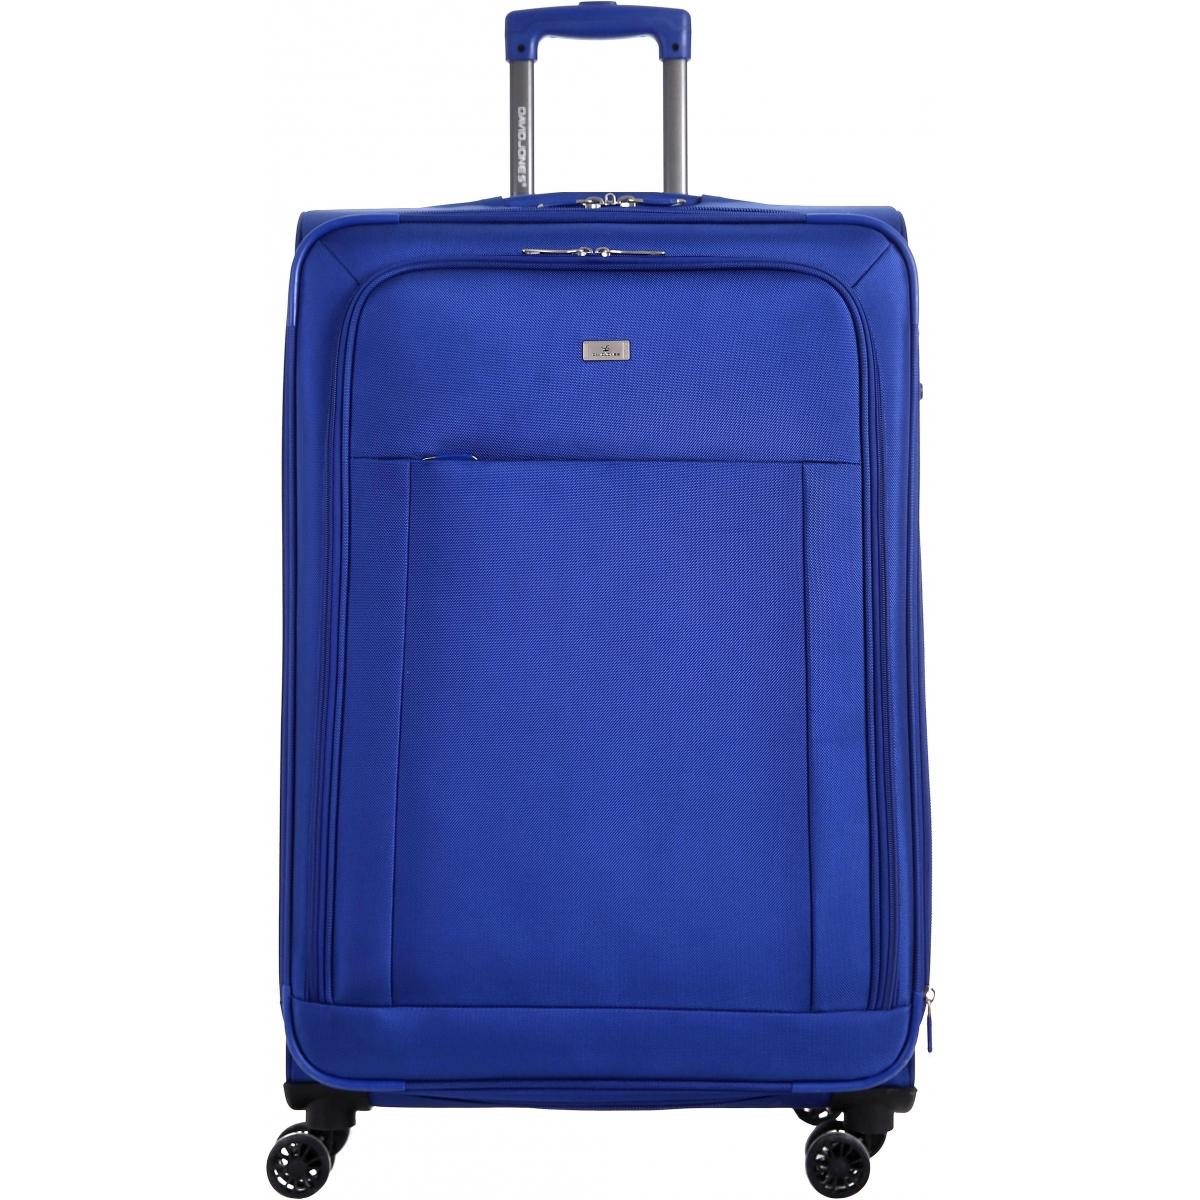 valise souple extensible david jones taille g 79 cm tsa. Black Bedroom Furniture Sets. Home Design Ideas